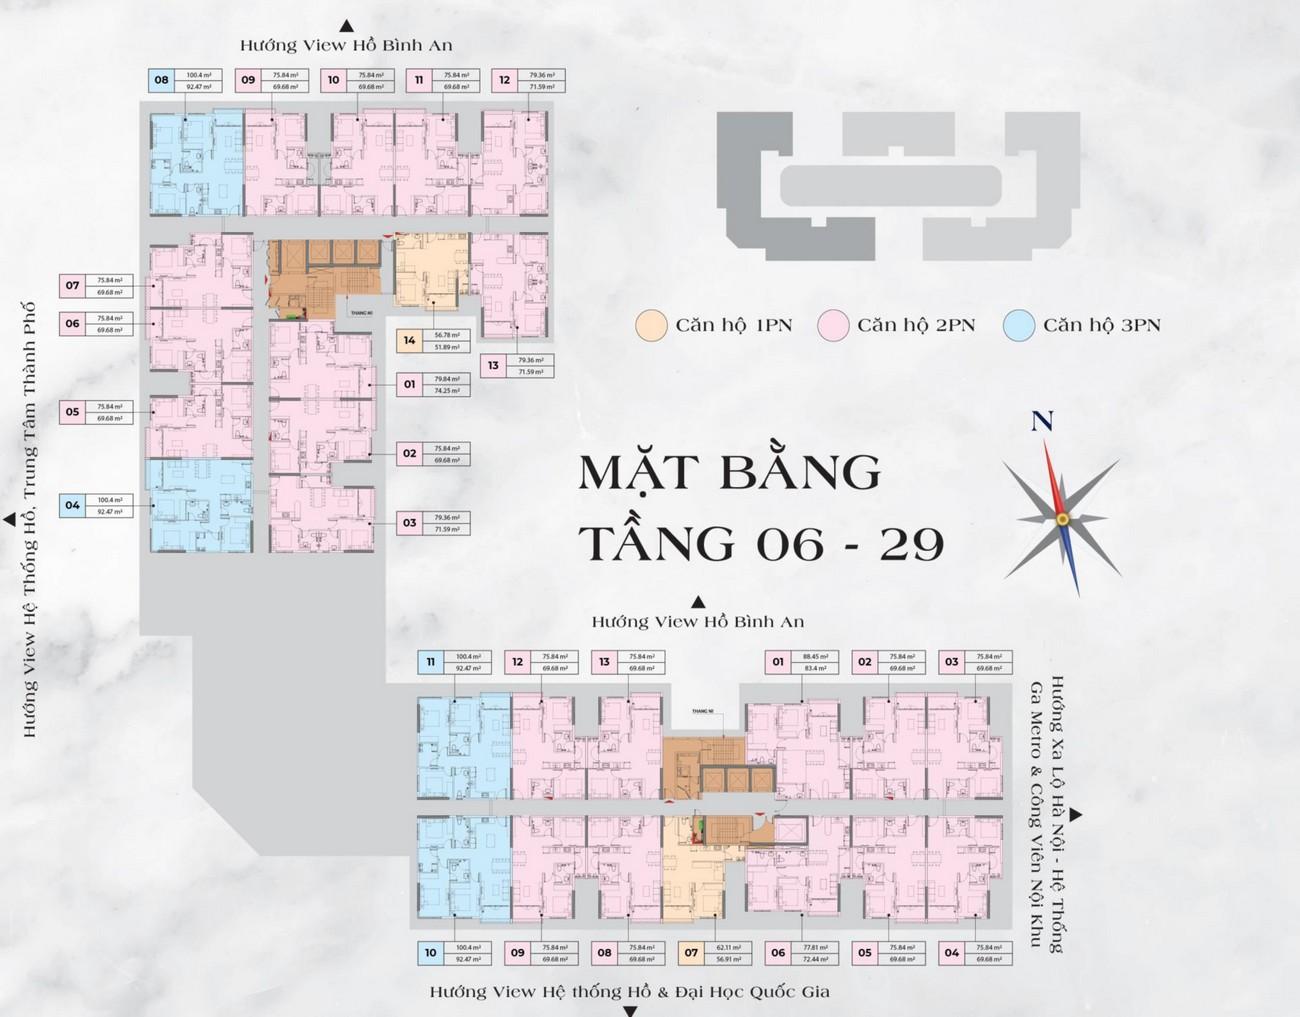 mat-bang-thiet-ke-tang-06-den-tang-29-can-ho-ldg-sky